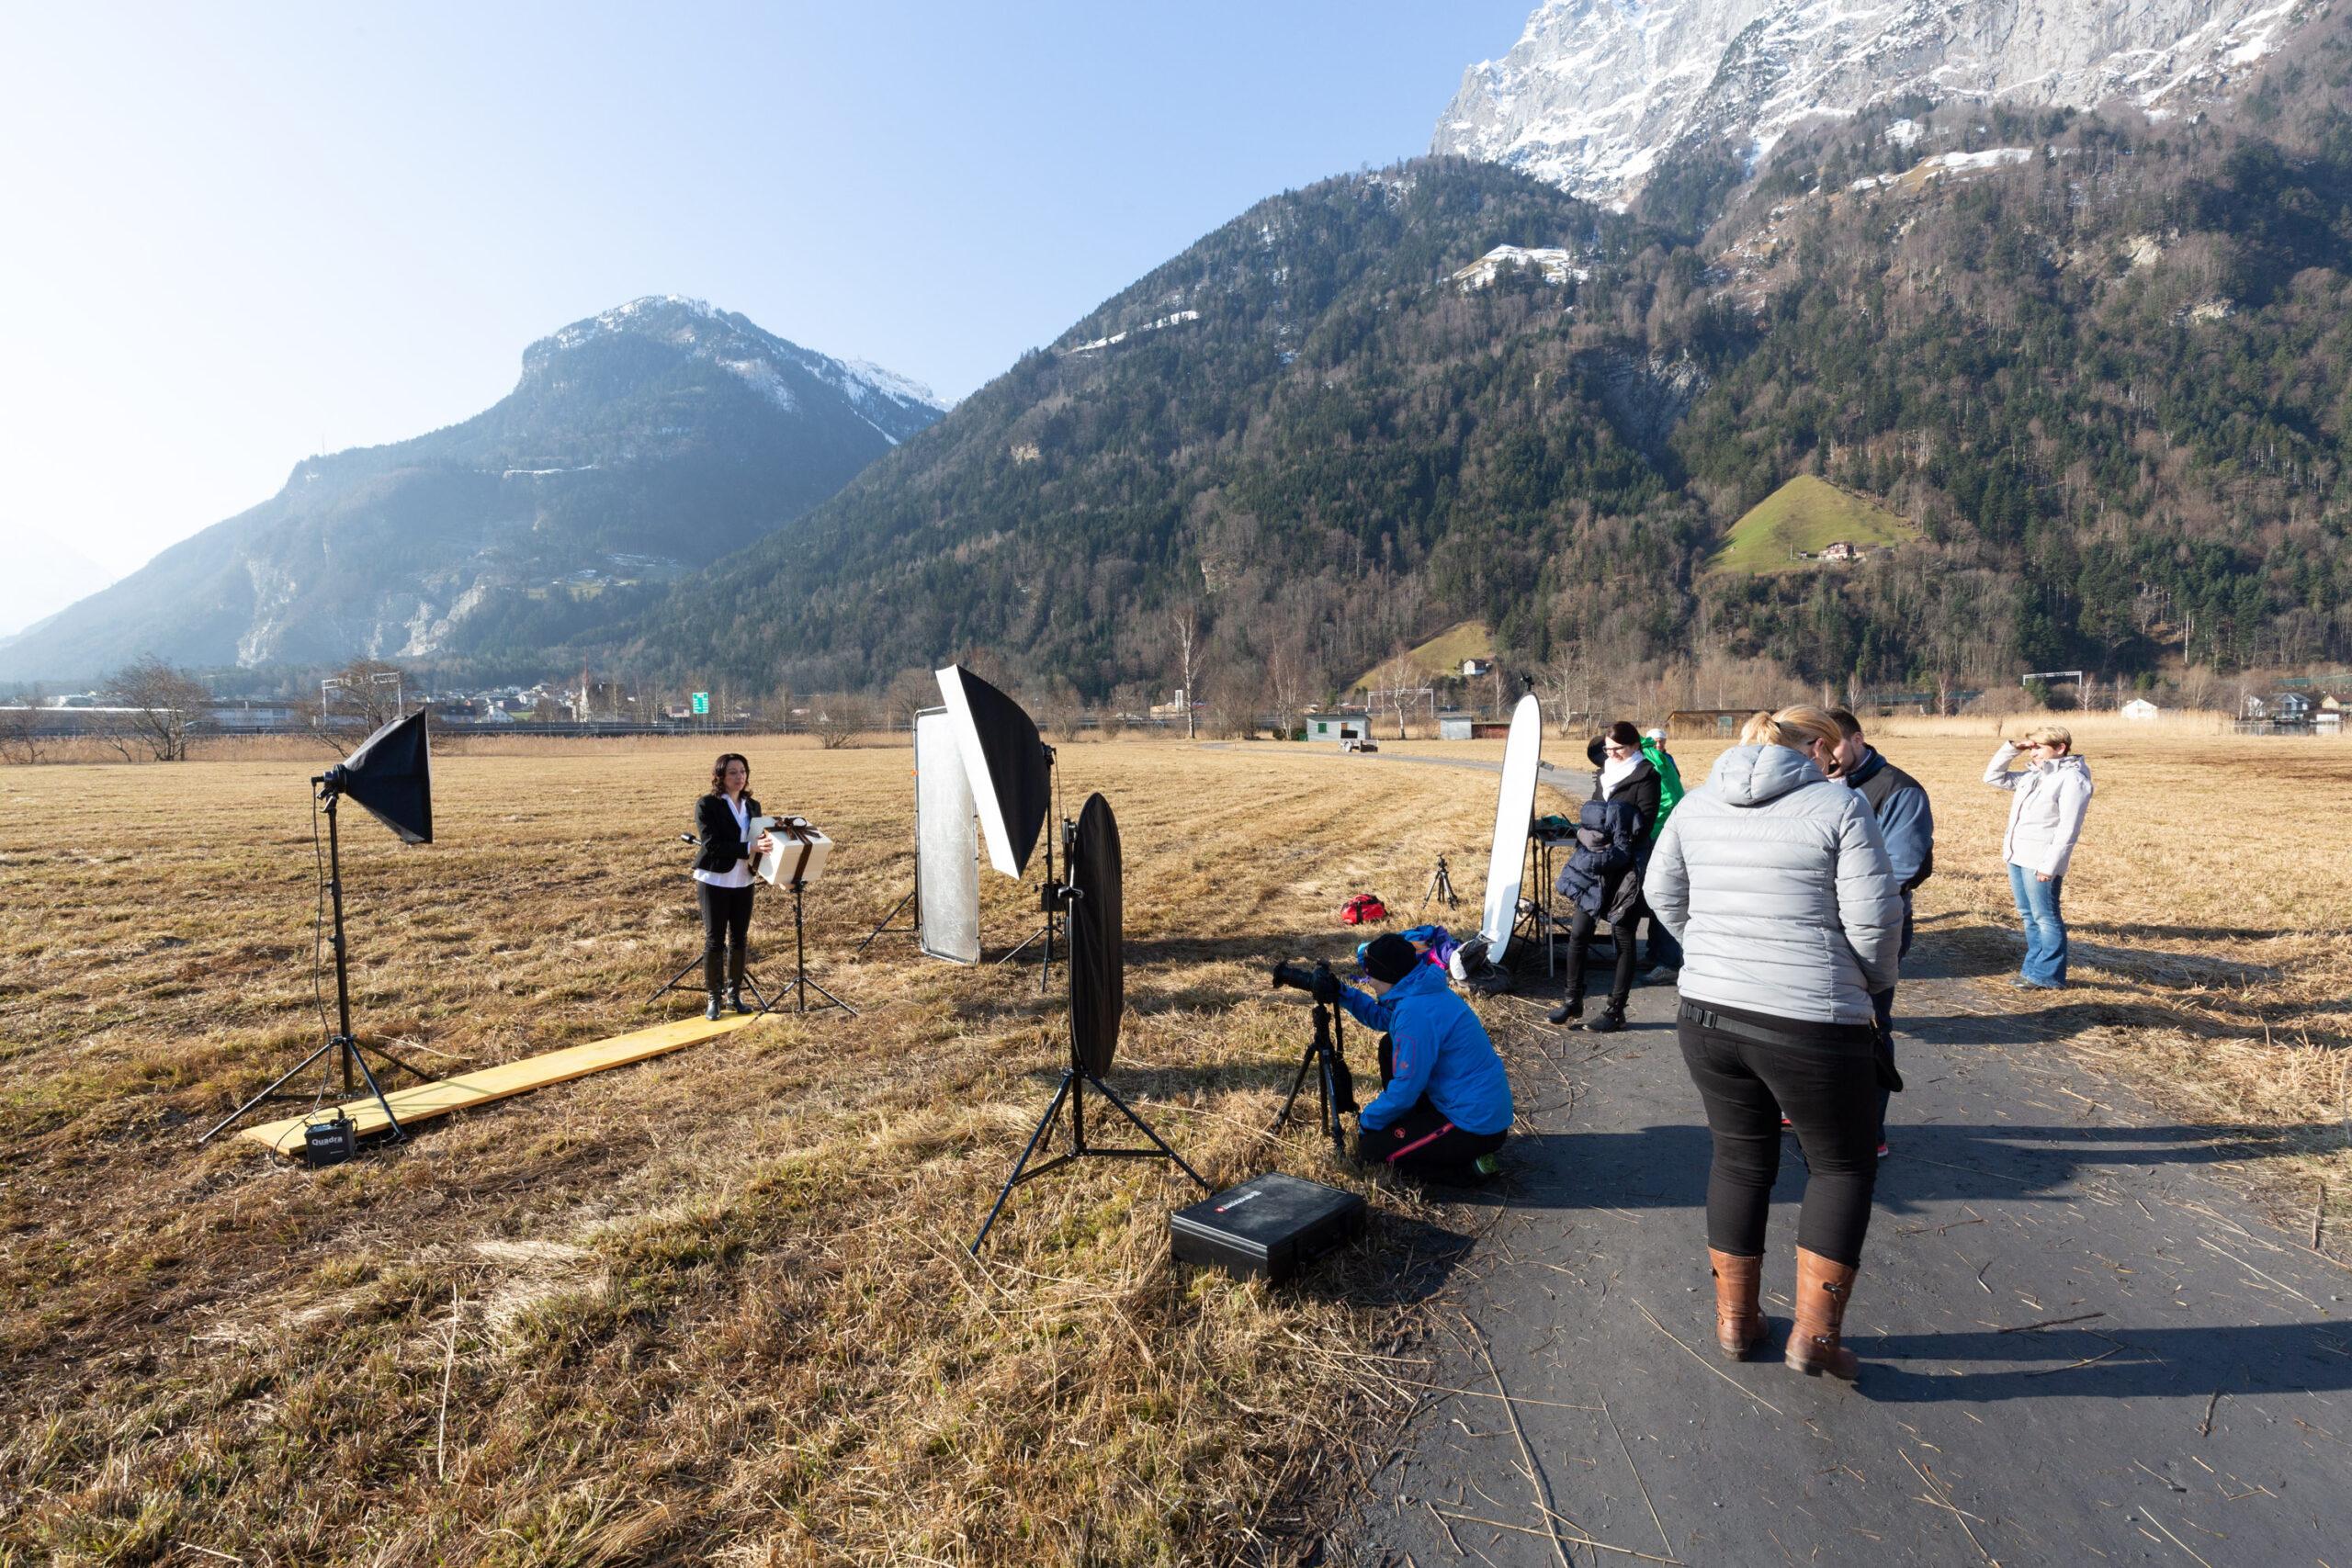 Meier & Kamer Making-of Fotografie Werbekampagne zum 100 Jahr Jubiläum der Urner Kantonalbank UKB, F4 Plakat